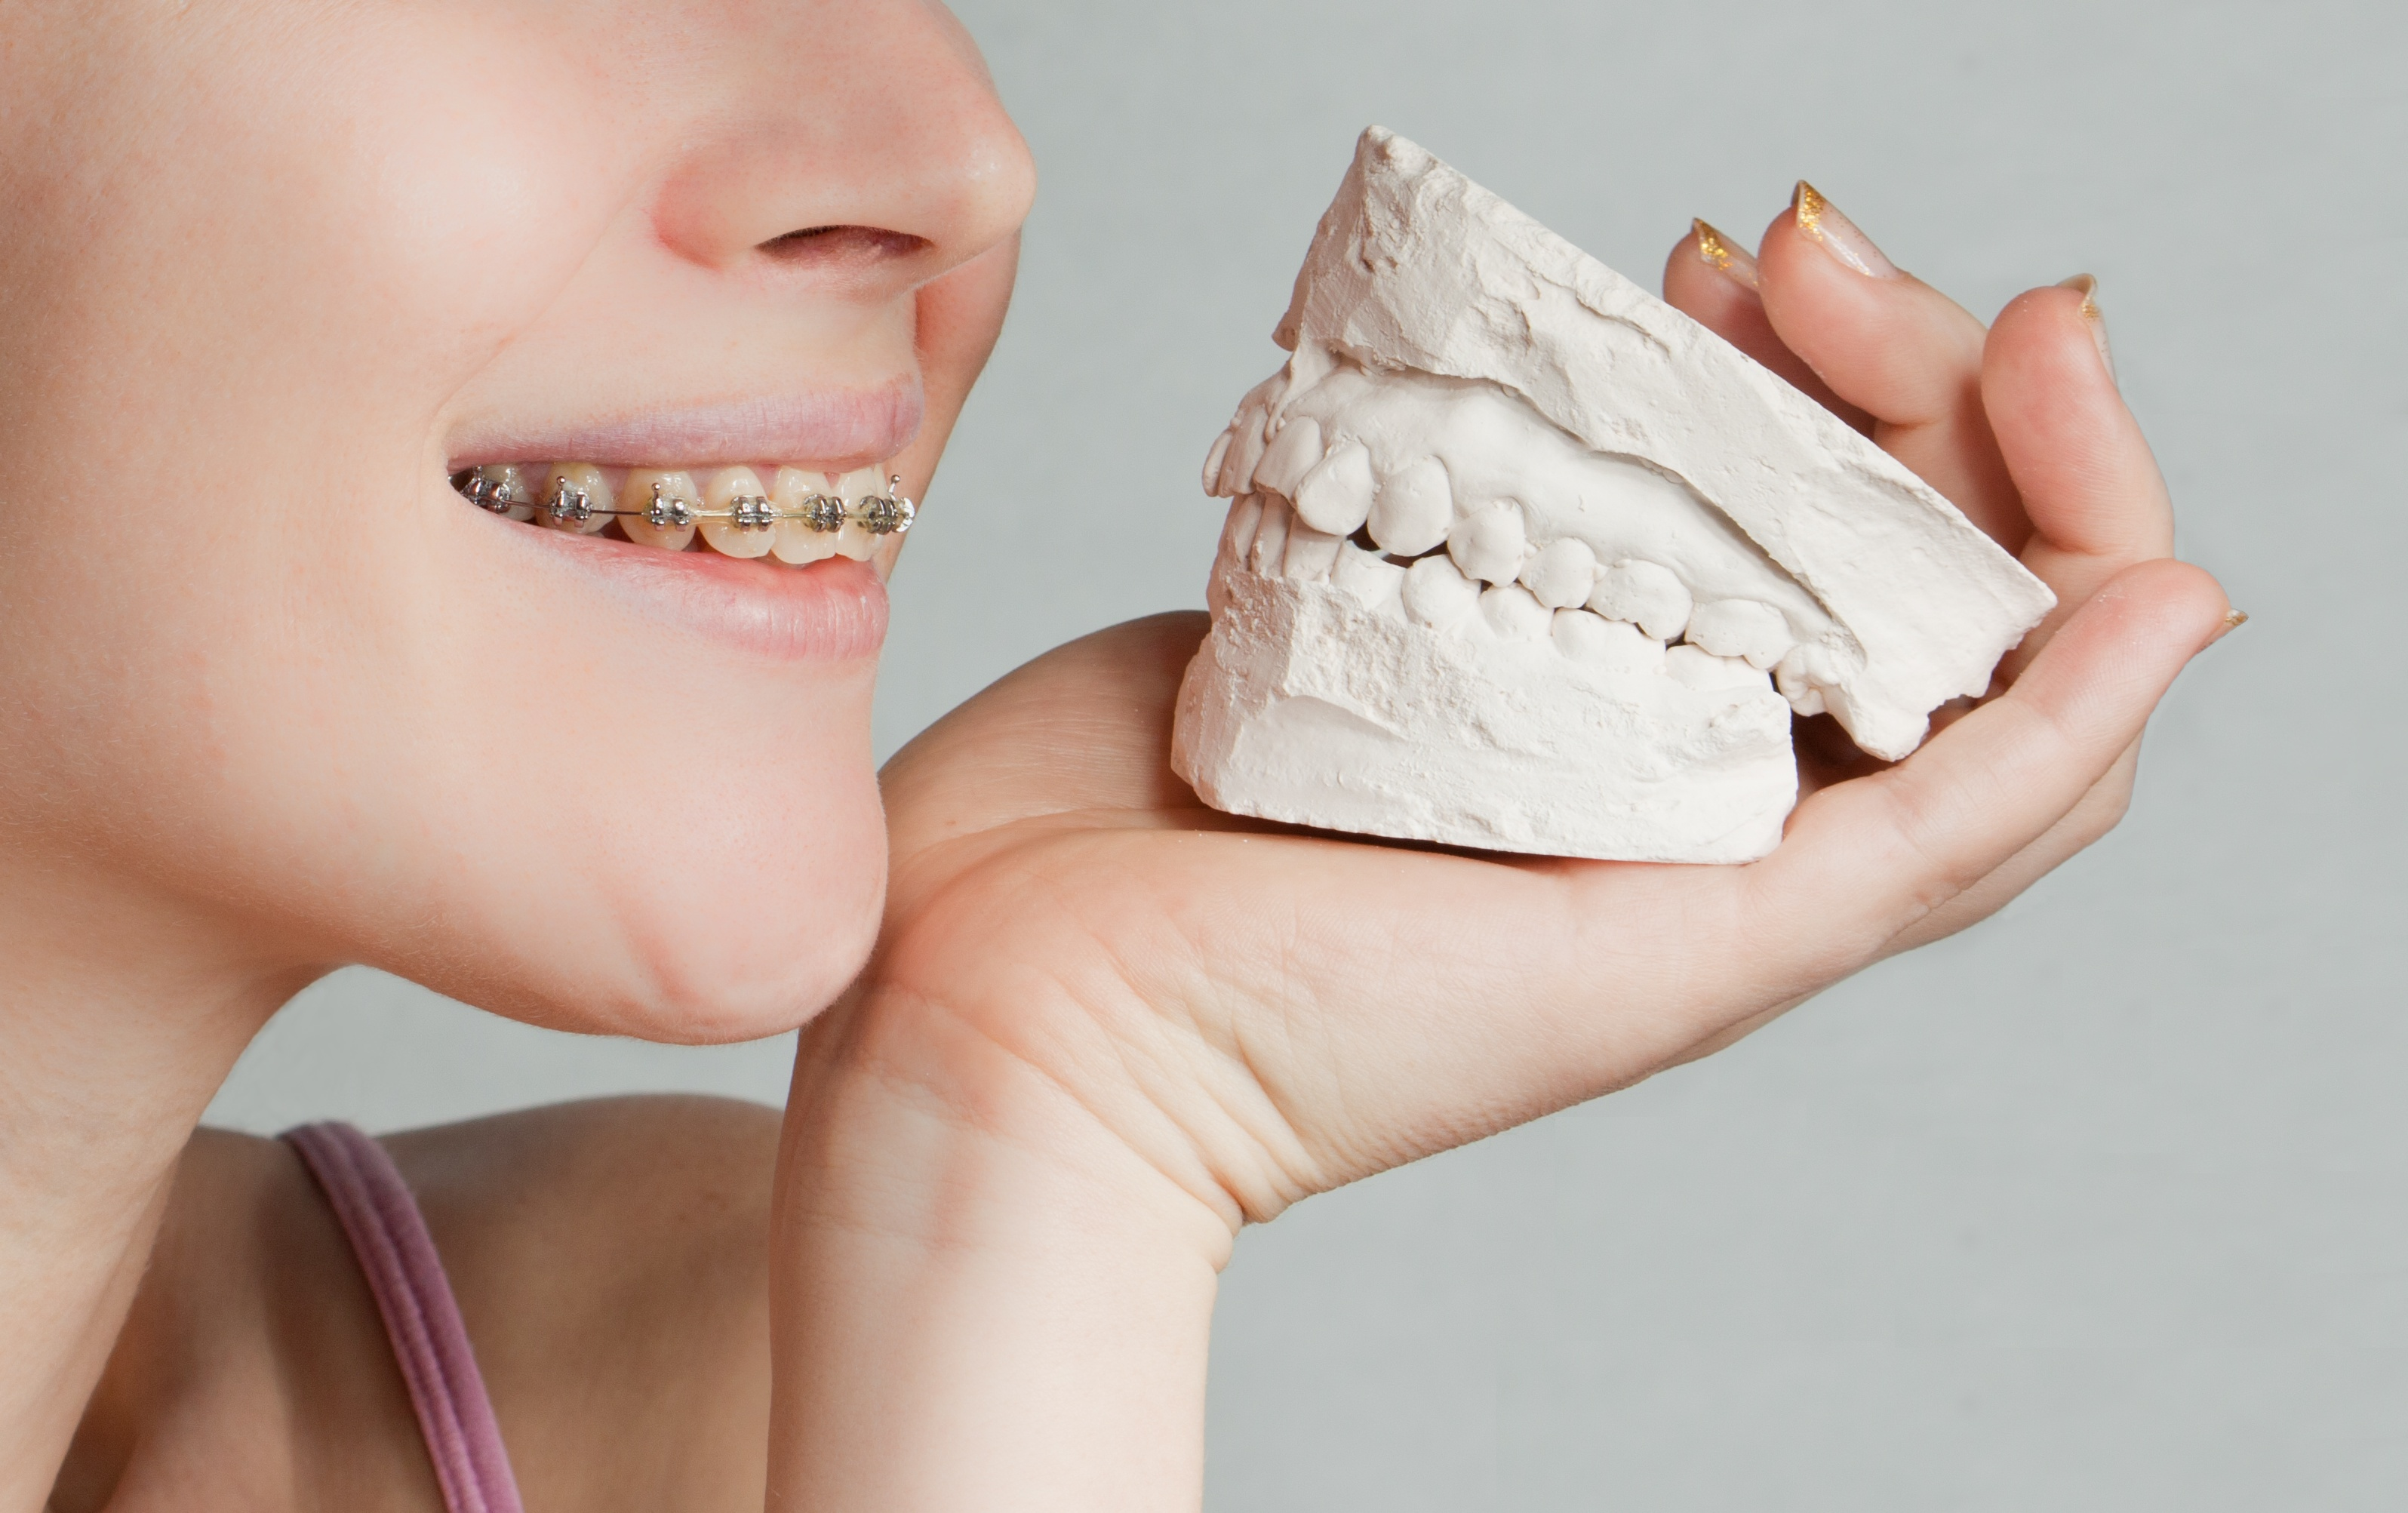 Garden City South Orthodontist